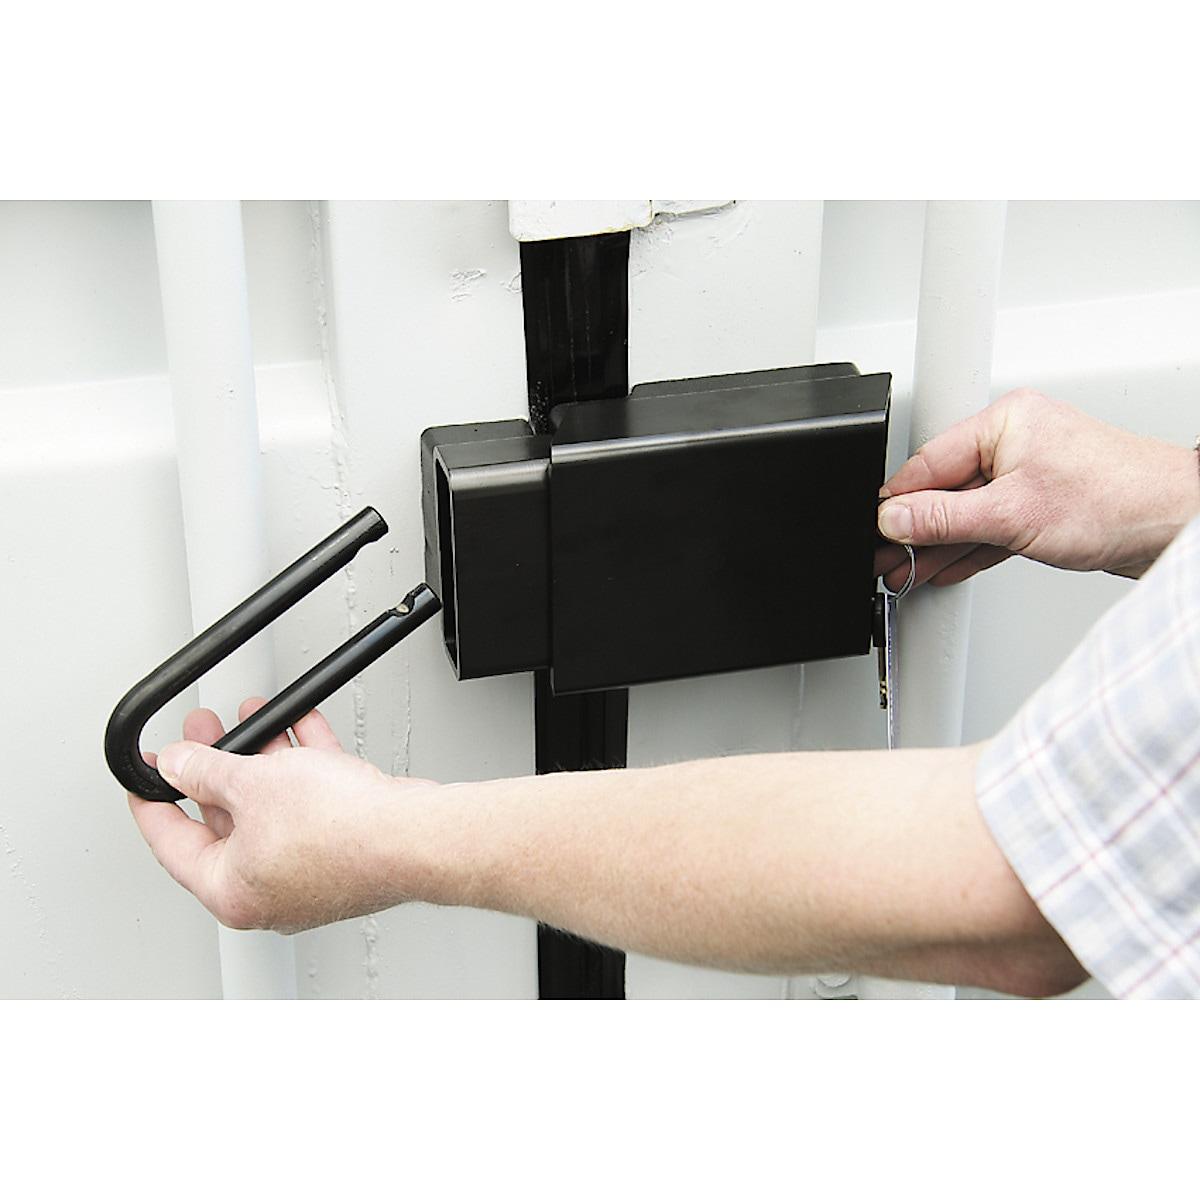 Containerlås Abus Conlock 215/100 3770HB100 klass 4 Granit